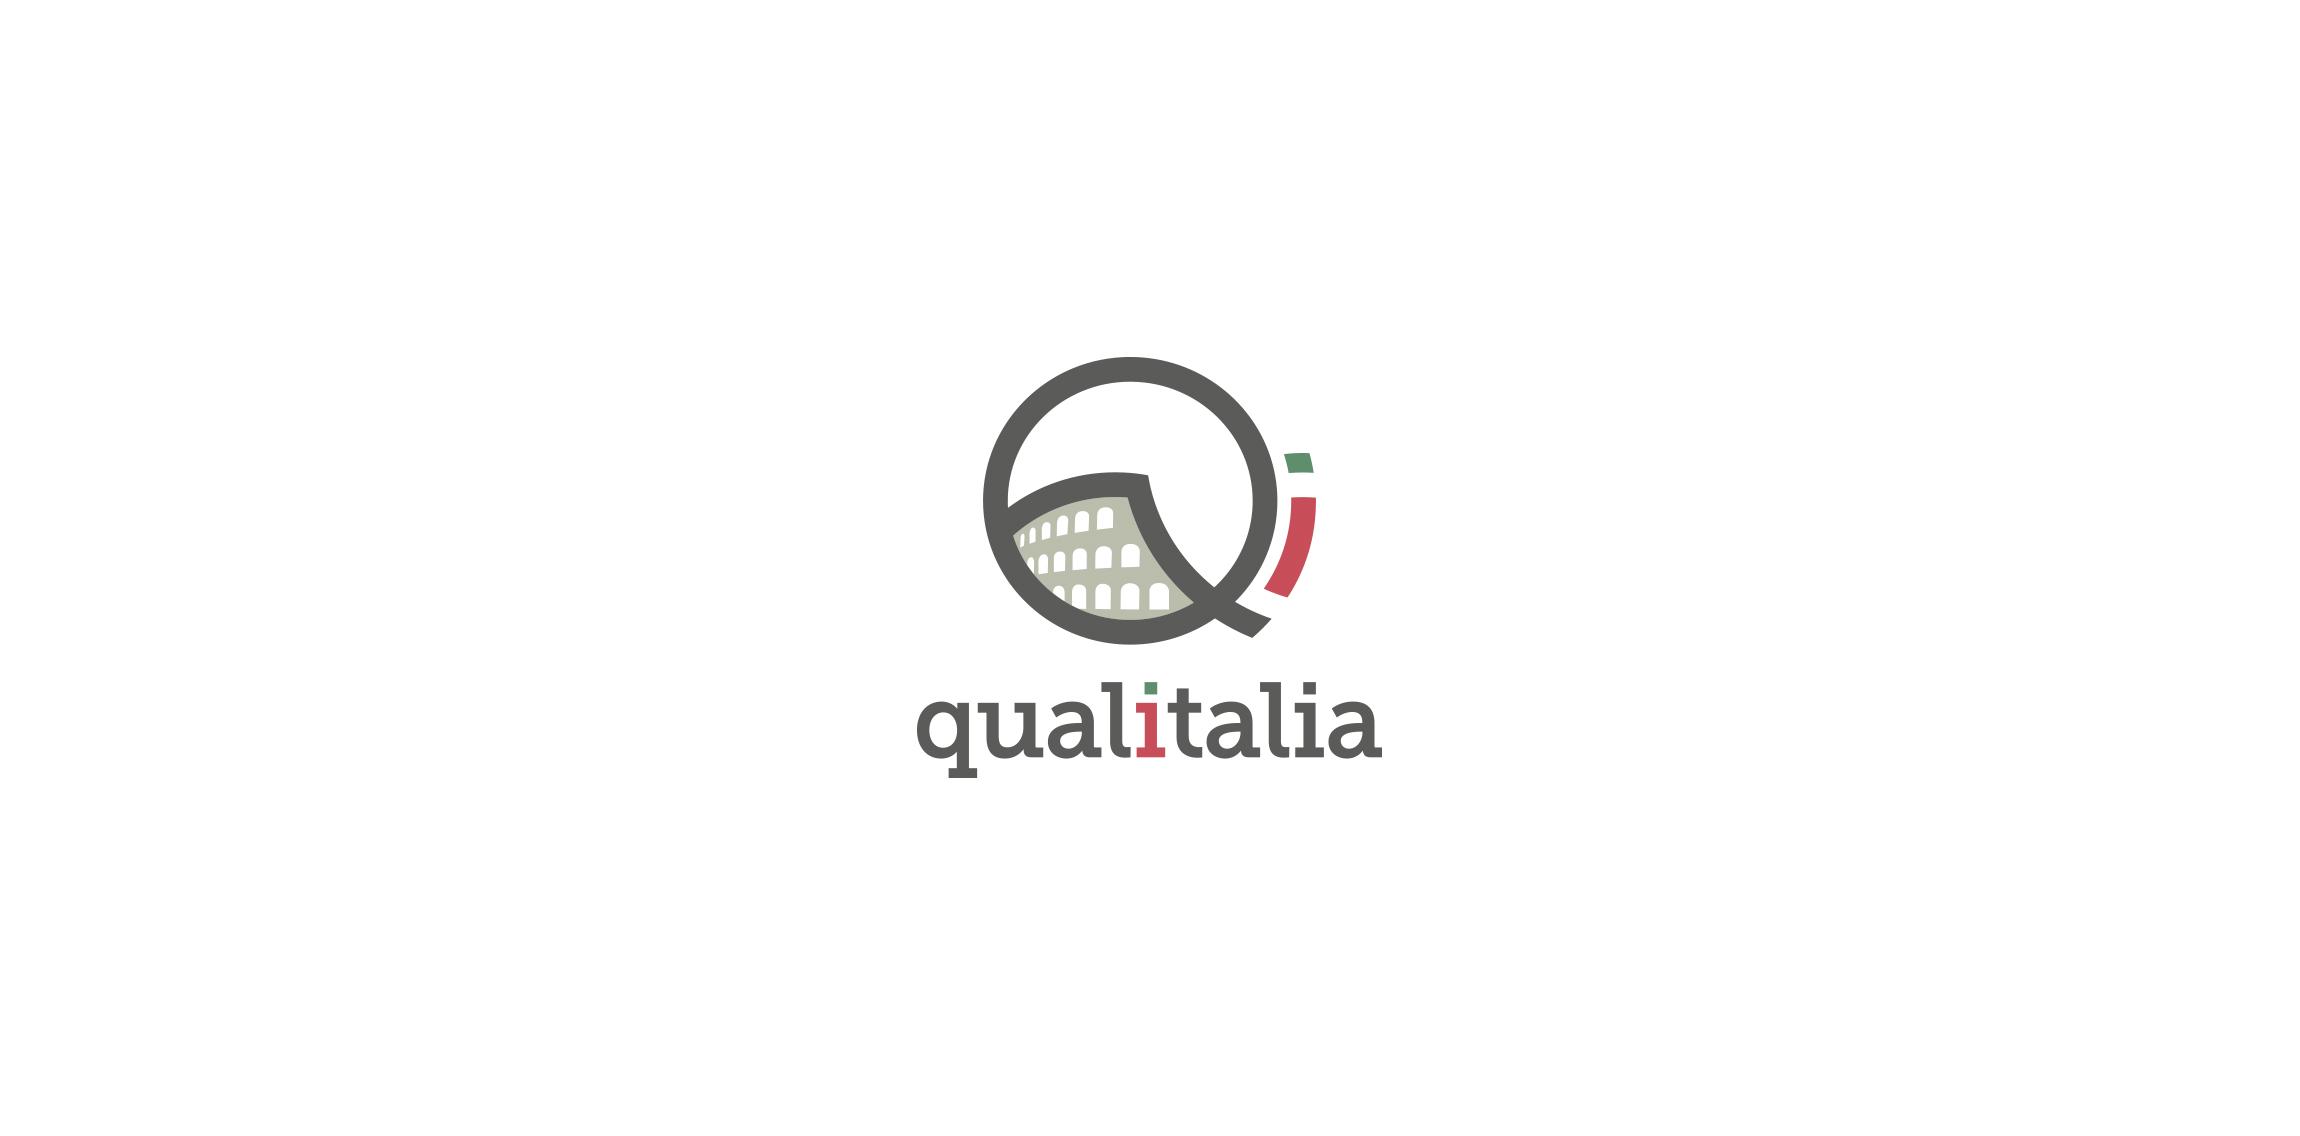 Qualitalia Rebrand